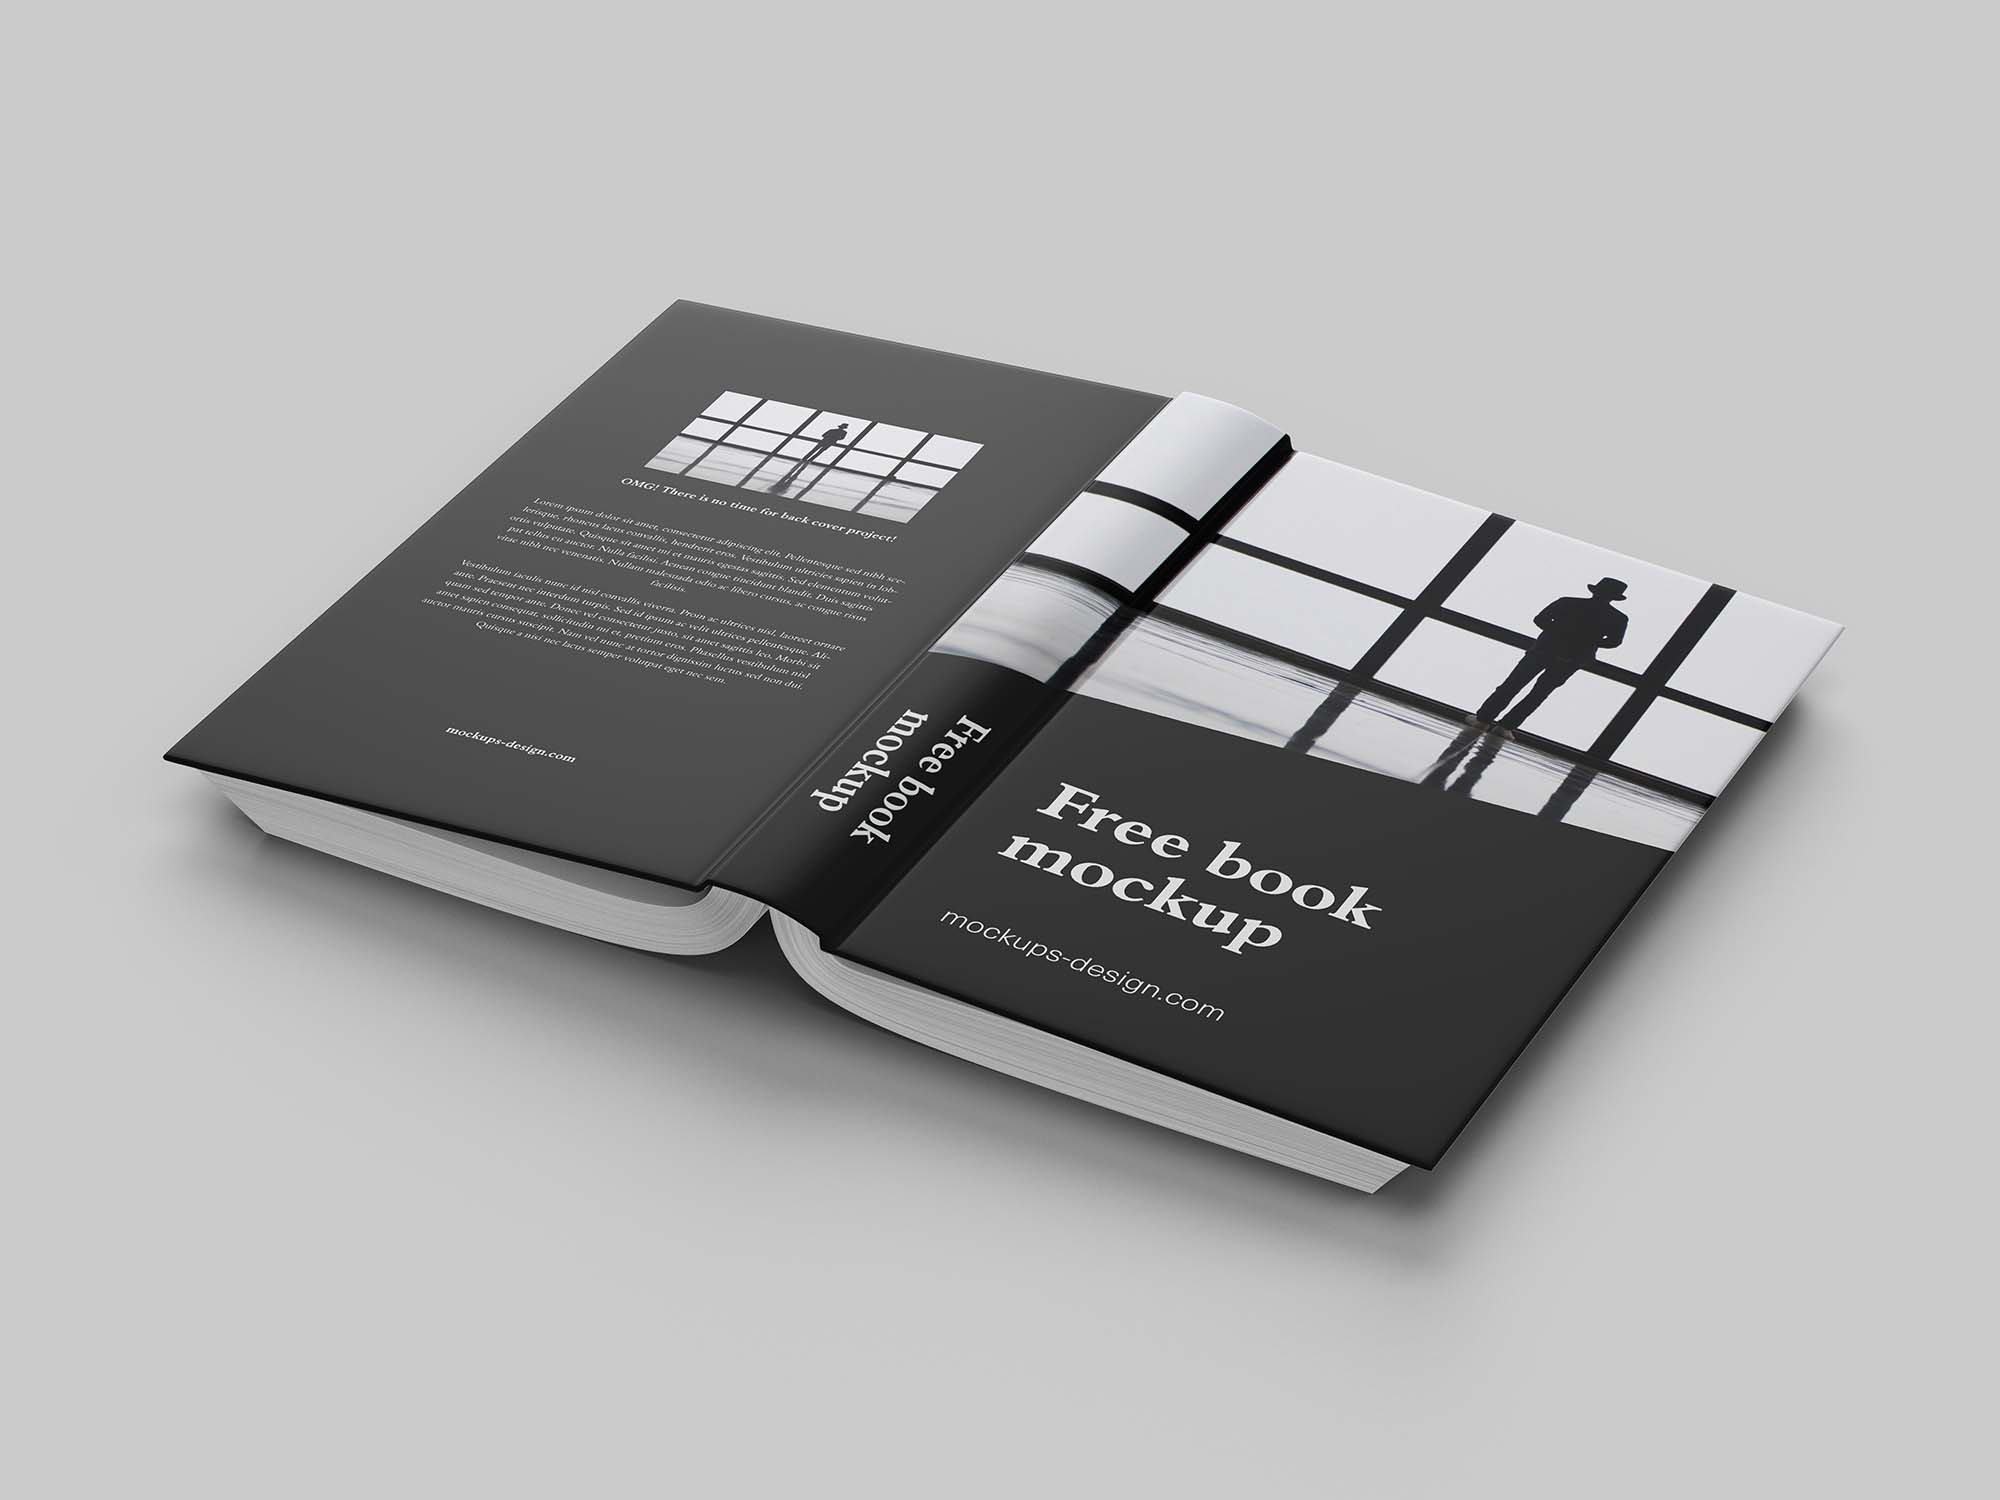 Book Mockup Back Cover